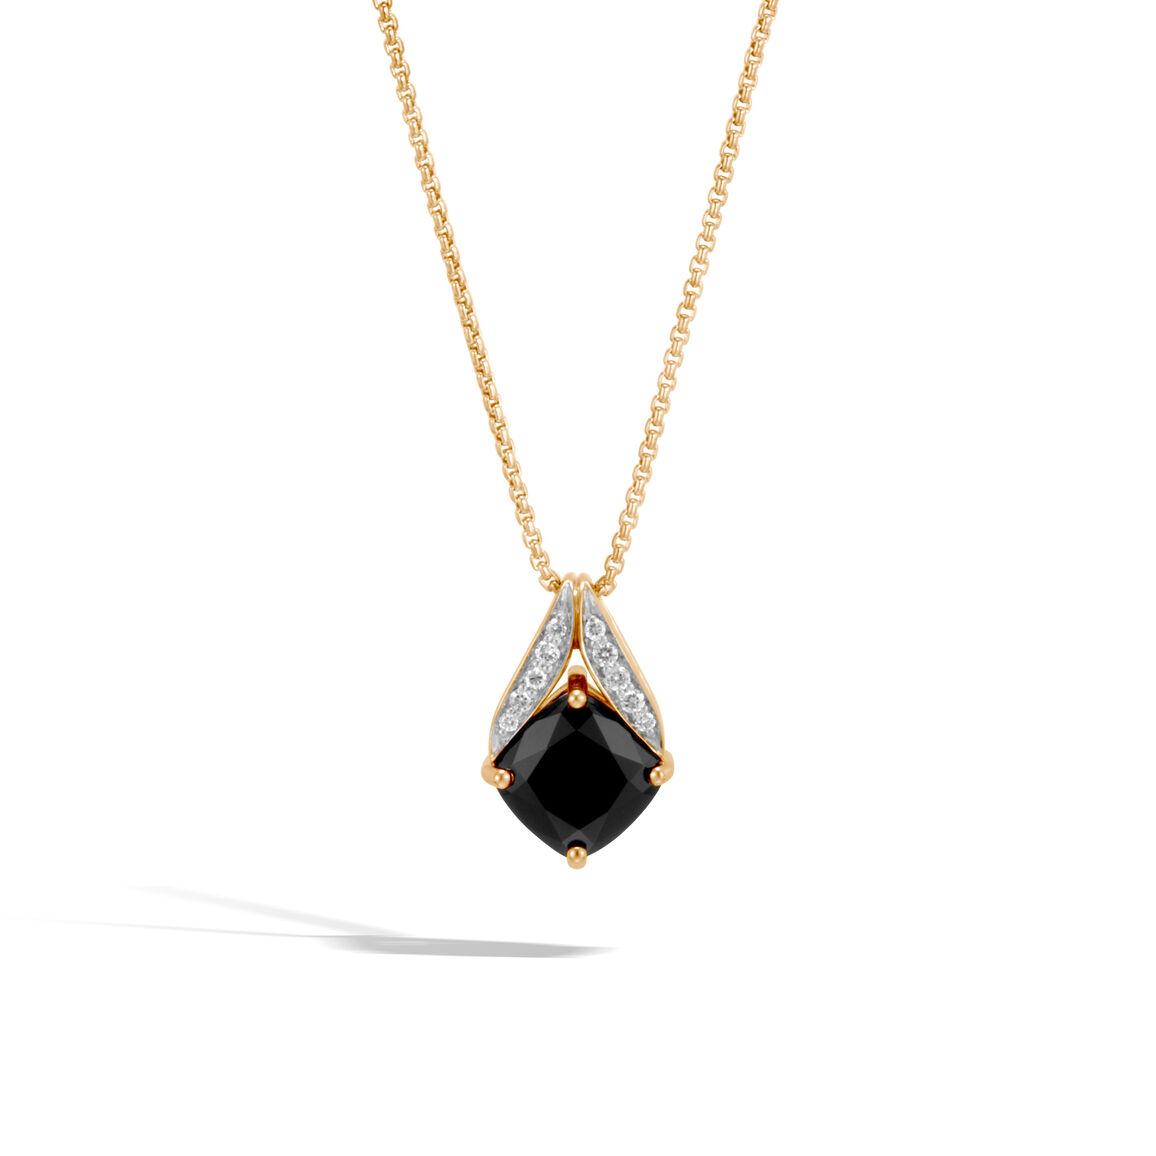 Modern Chain Magic Cut Pendant Necklace, 18K Gold, Gem, Dia